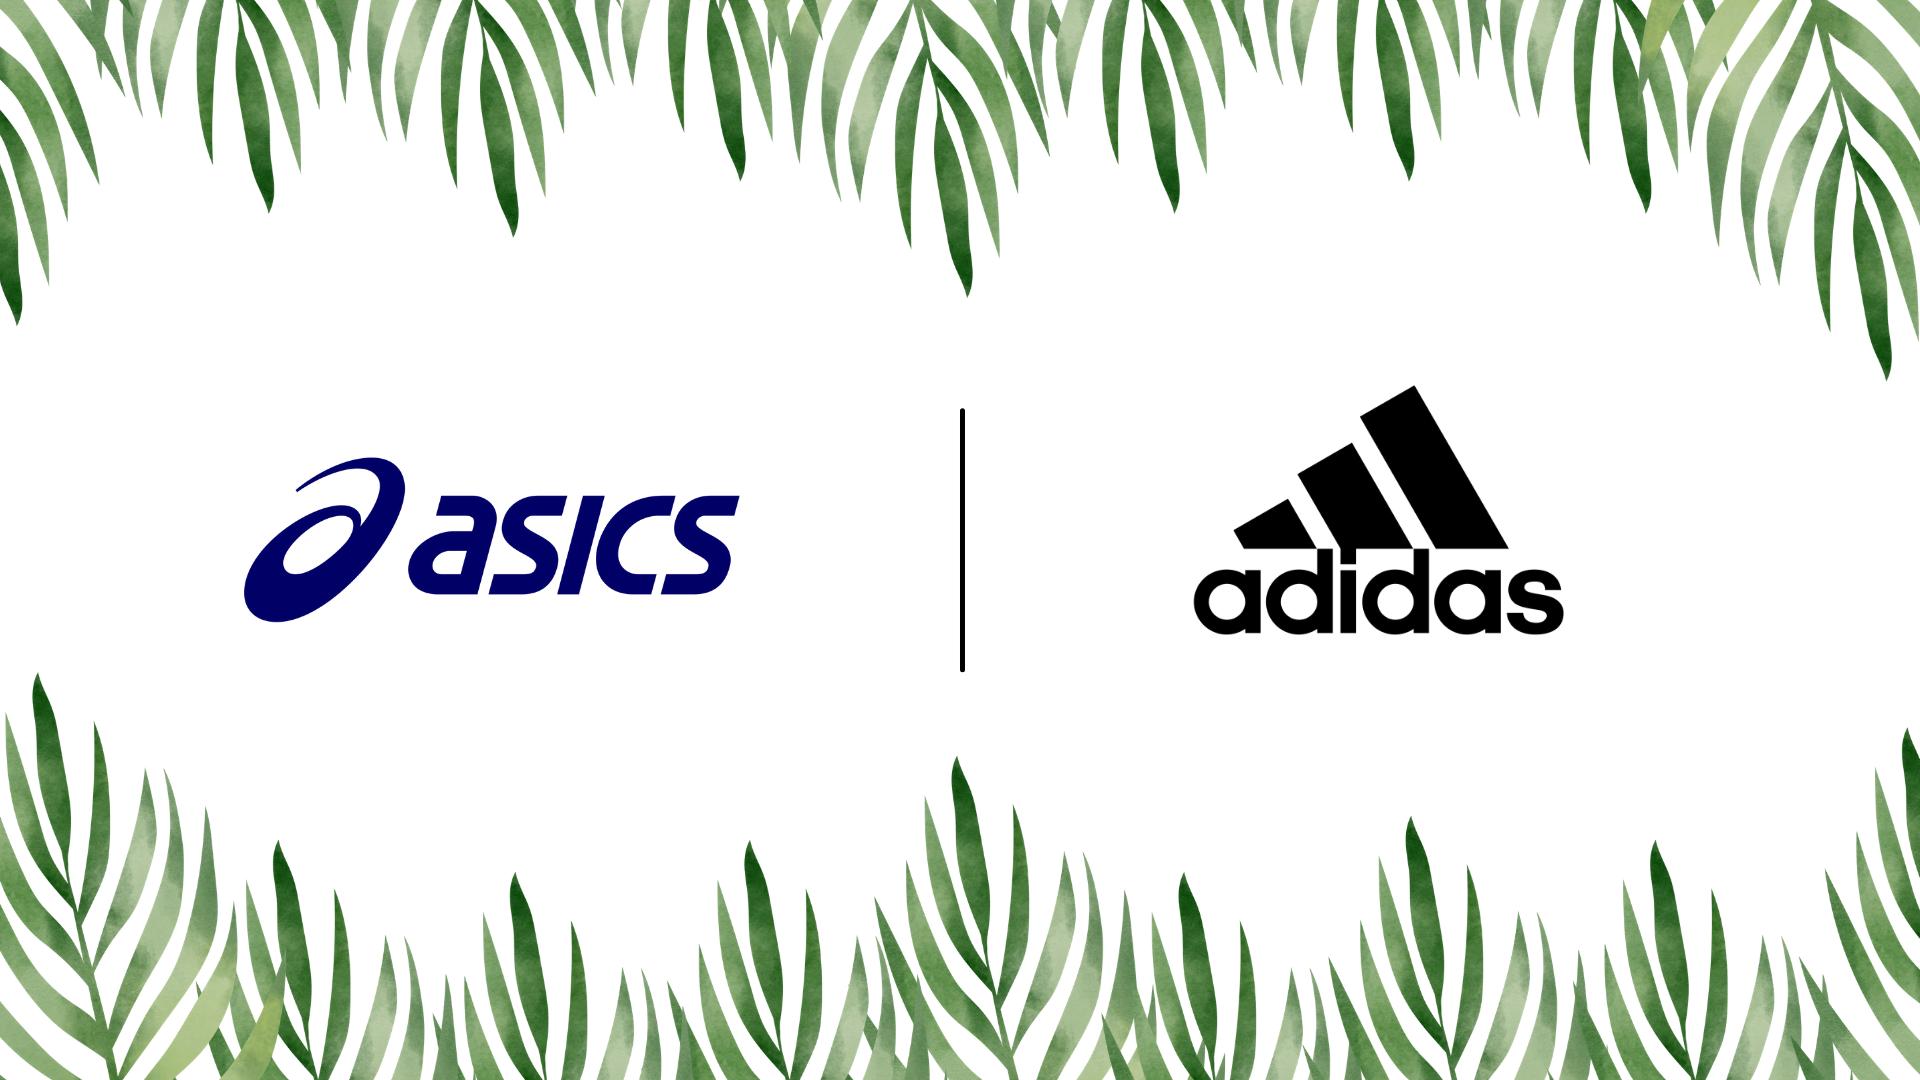 Adidas_Asics-MELCHIOR